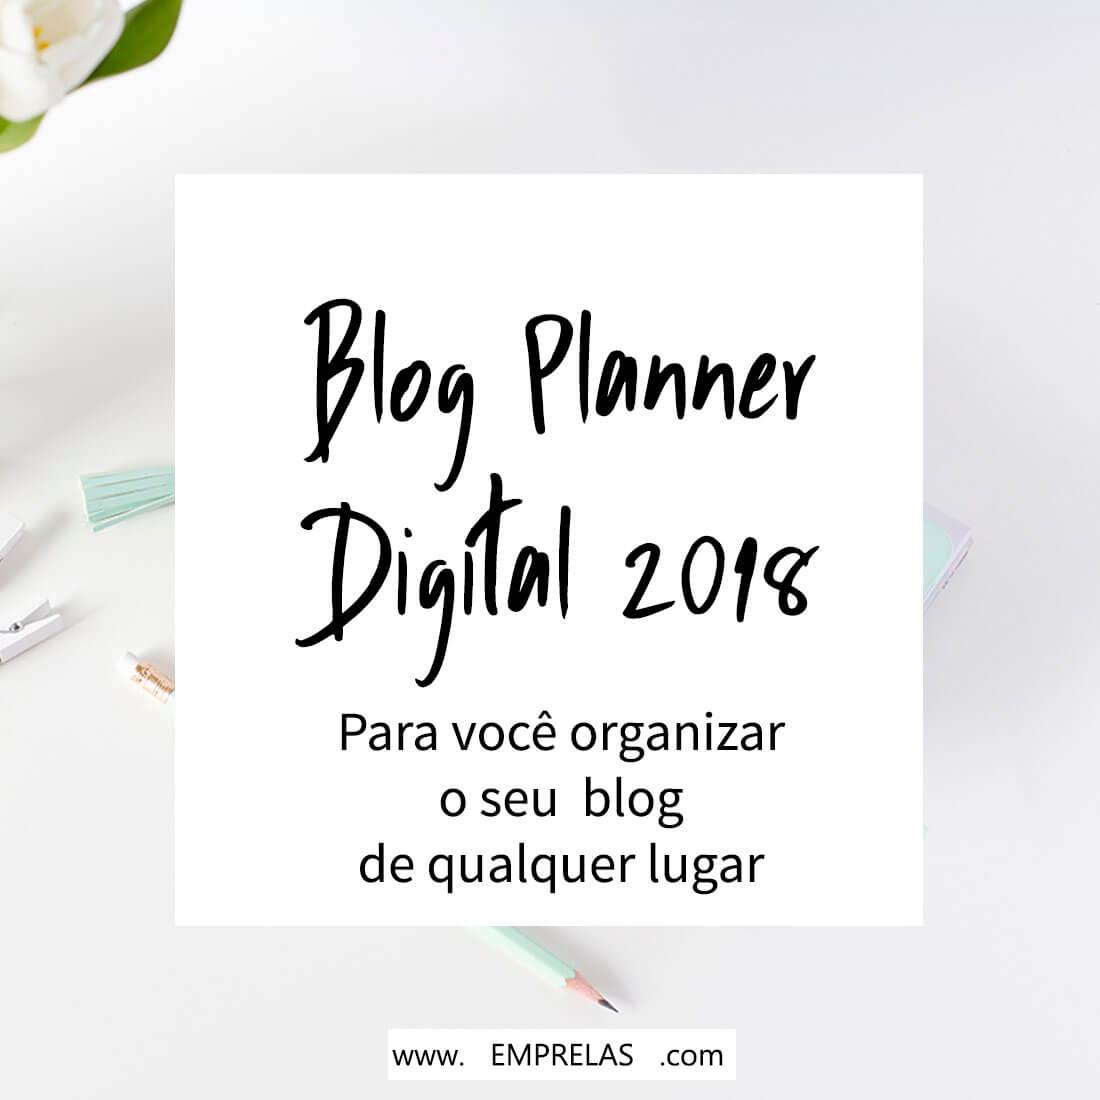 Blog planner Digital 2018